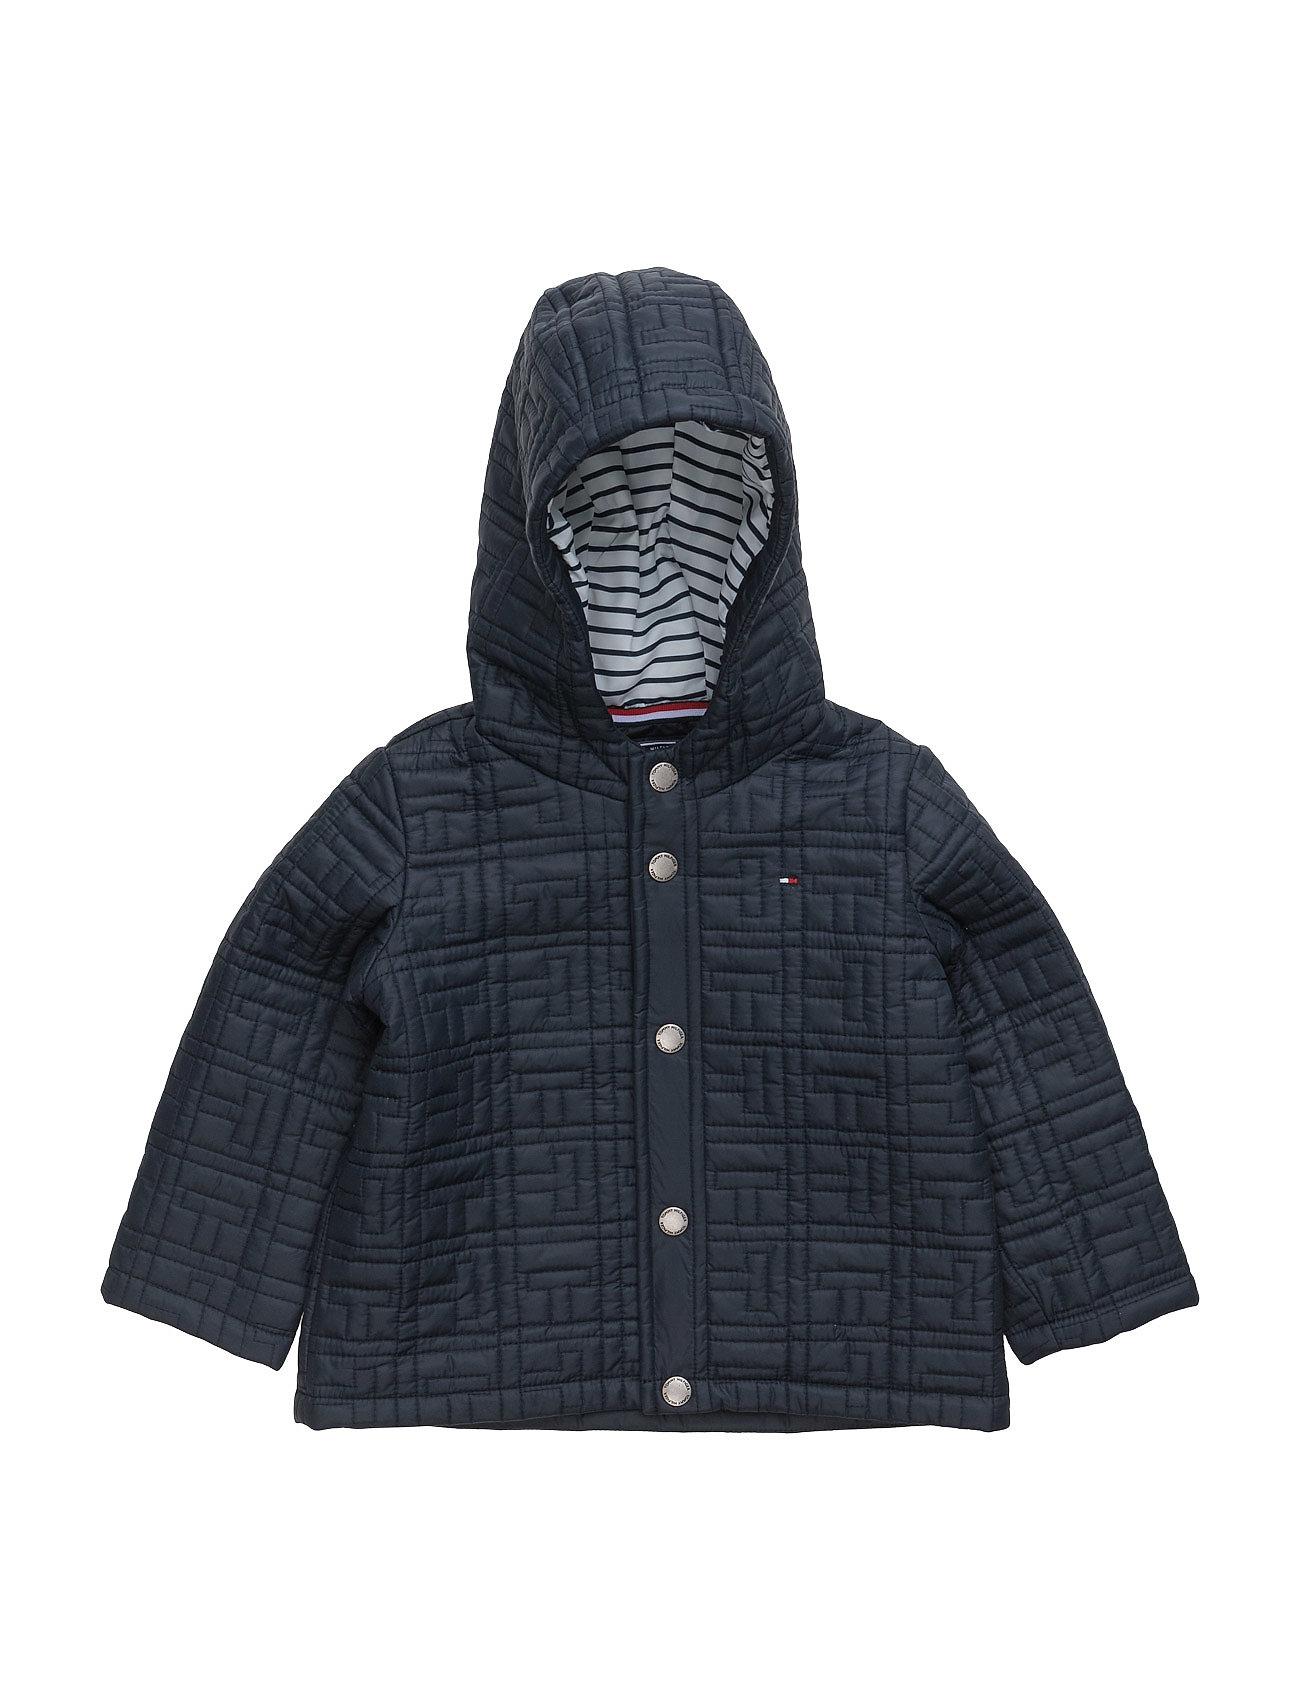 Thnb Baby Jacket Tommy Hilfiger Jackets & Coats